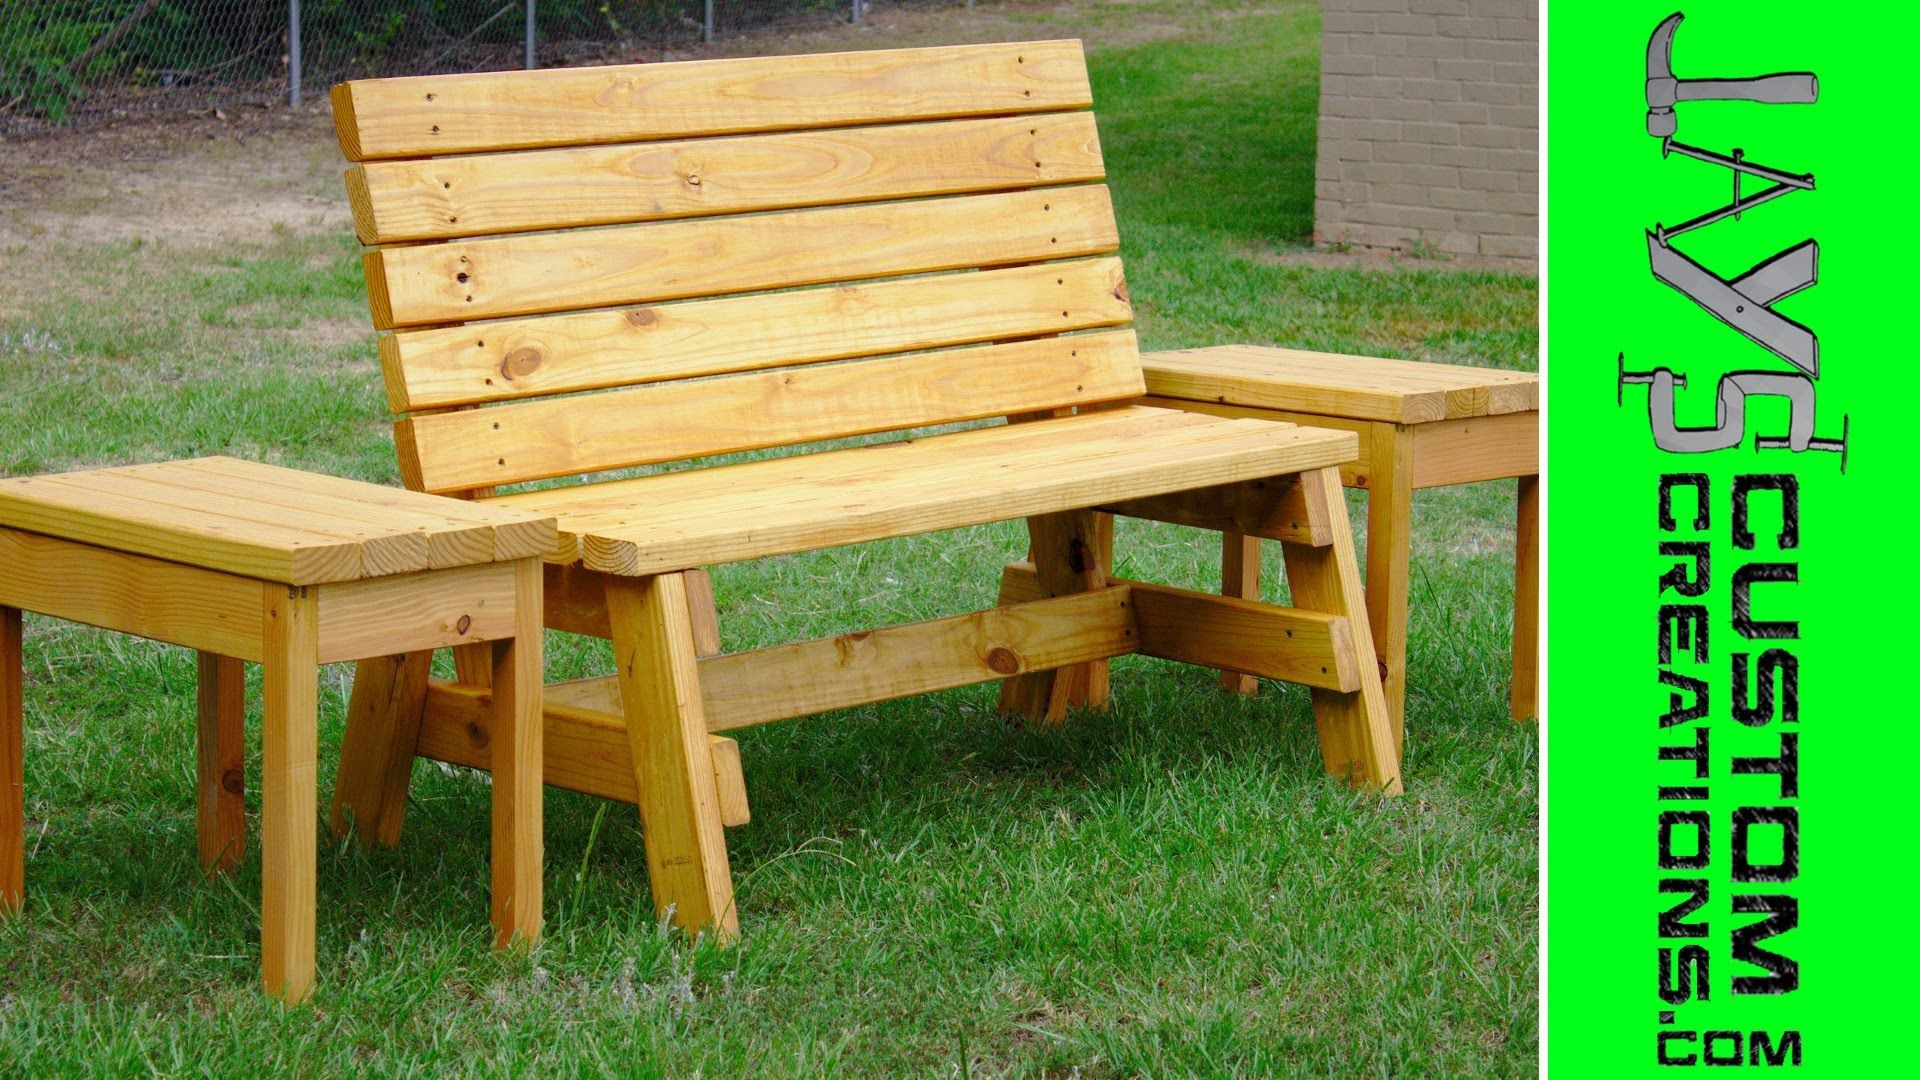 Stupendous How To Build A Comfortable 2X4 Garden Bench 104 Lamtechconsult Wood Chair Design Ideas Lamtechconsultcom